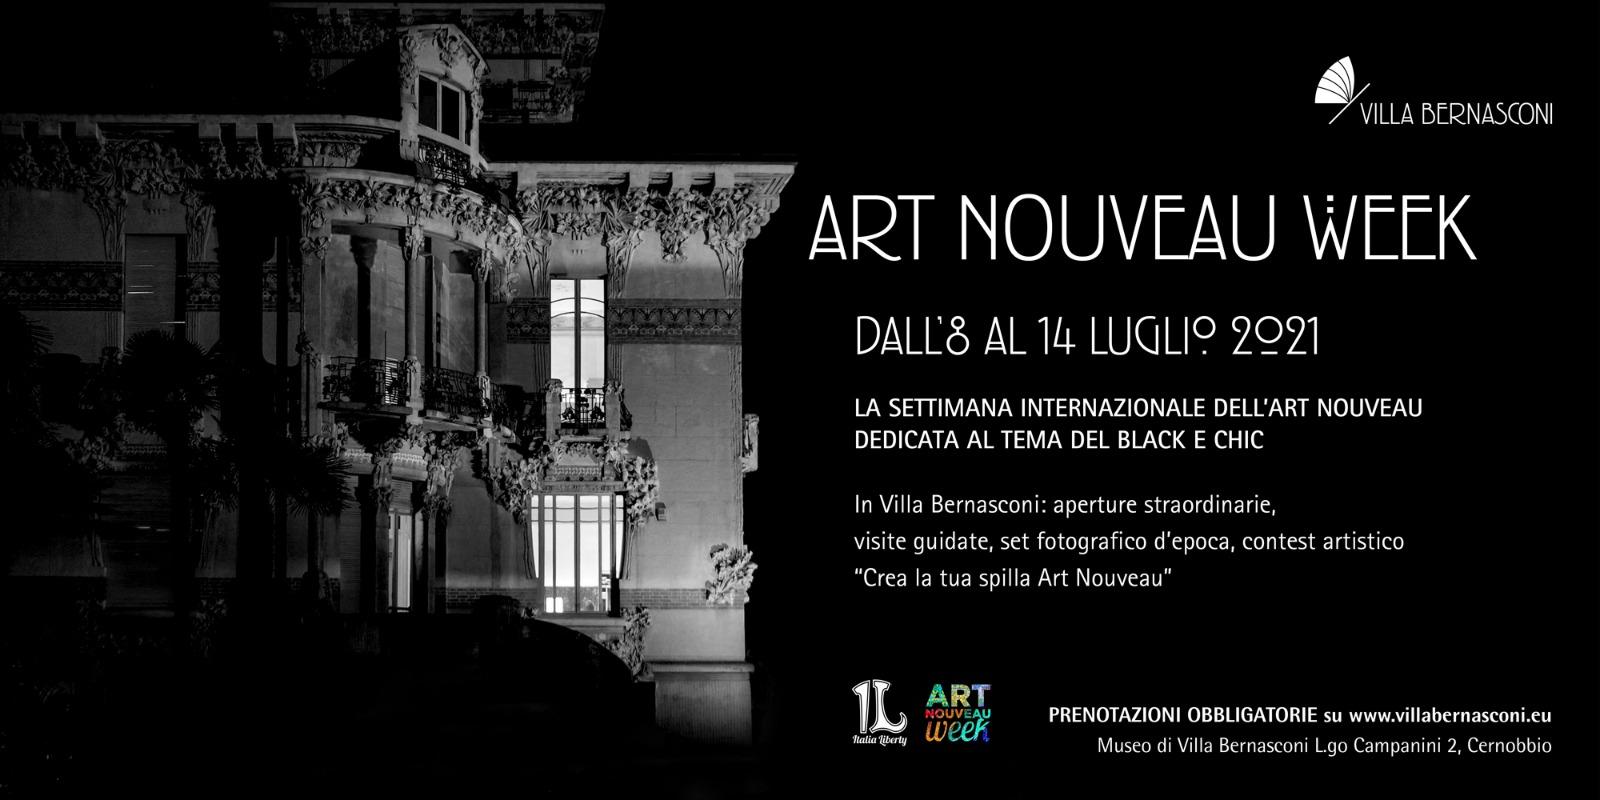 ART NOUVEAU WEEK 8-14 Luglio 2021